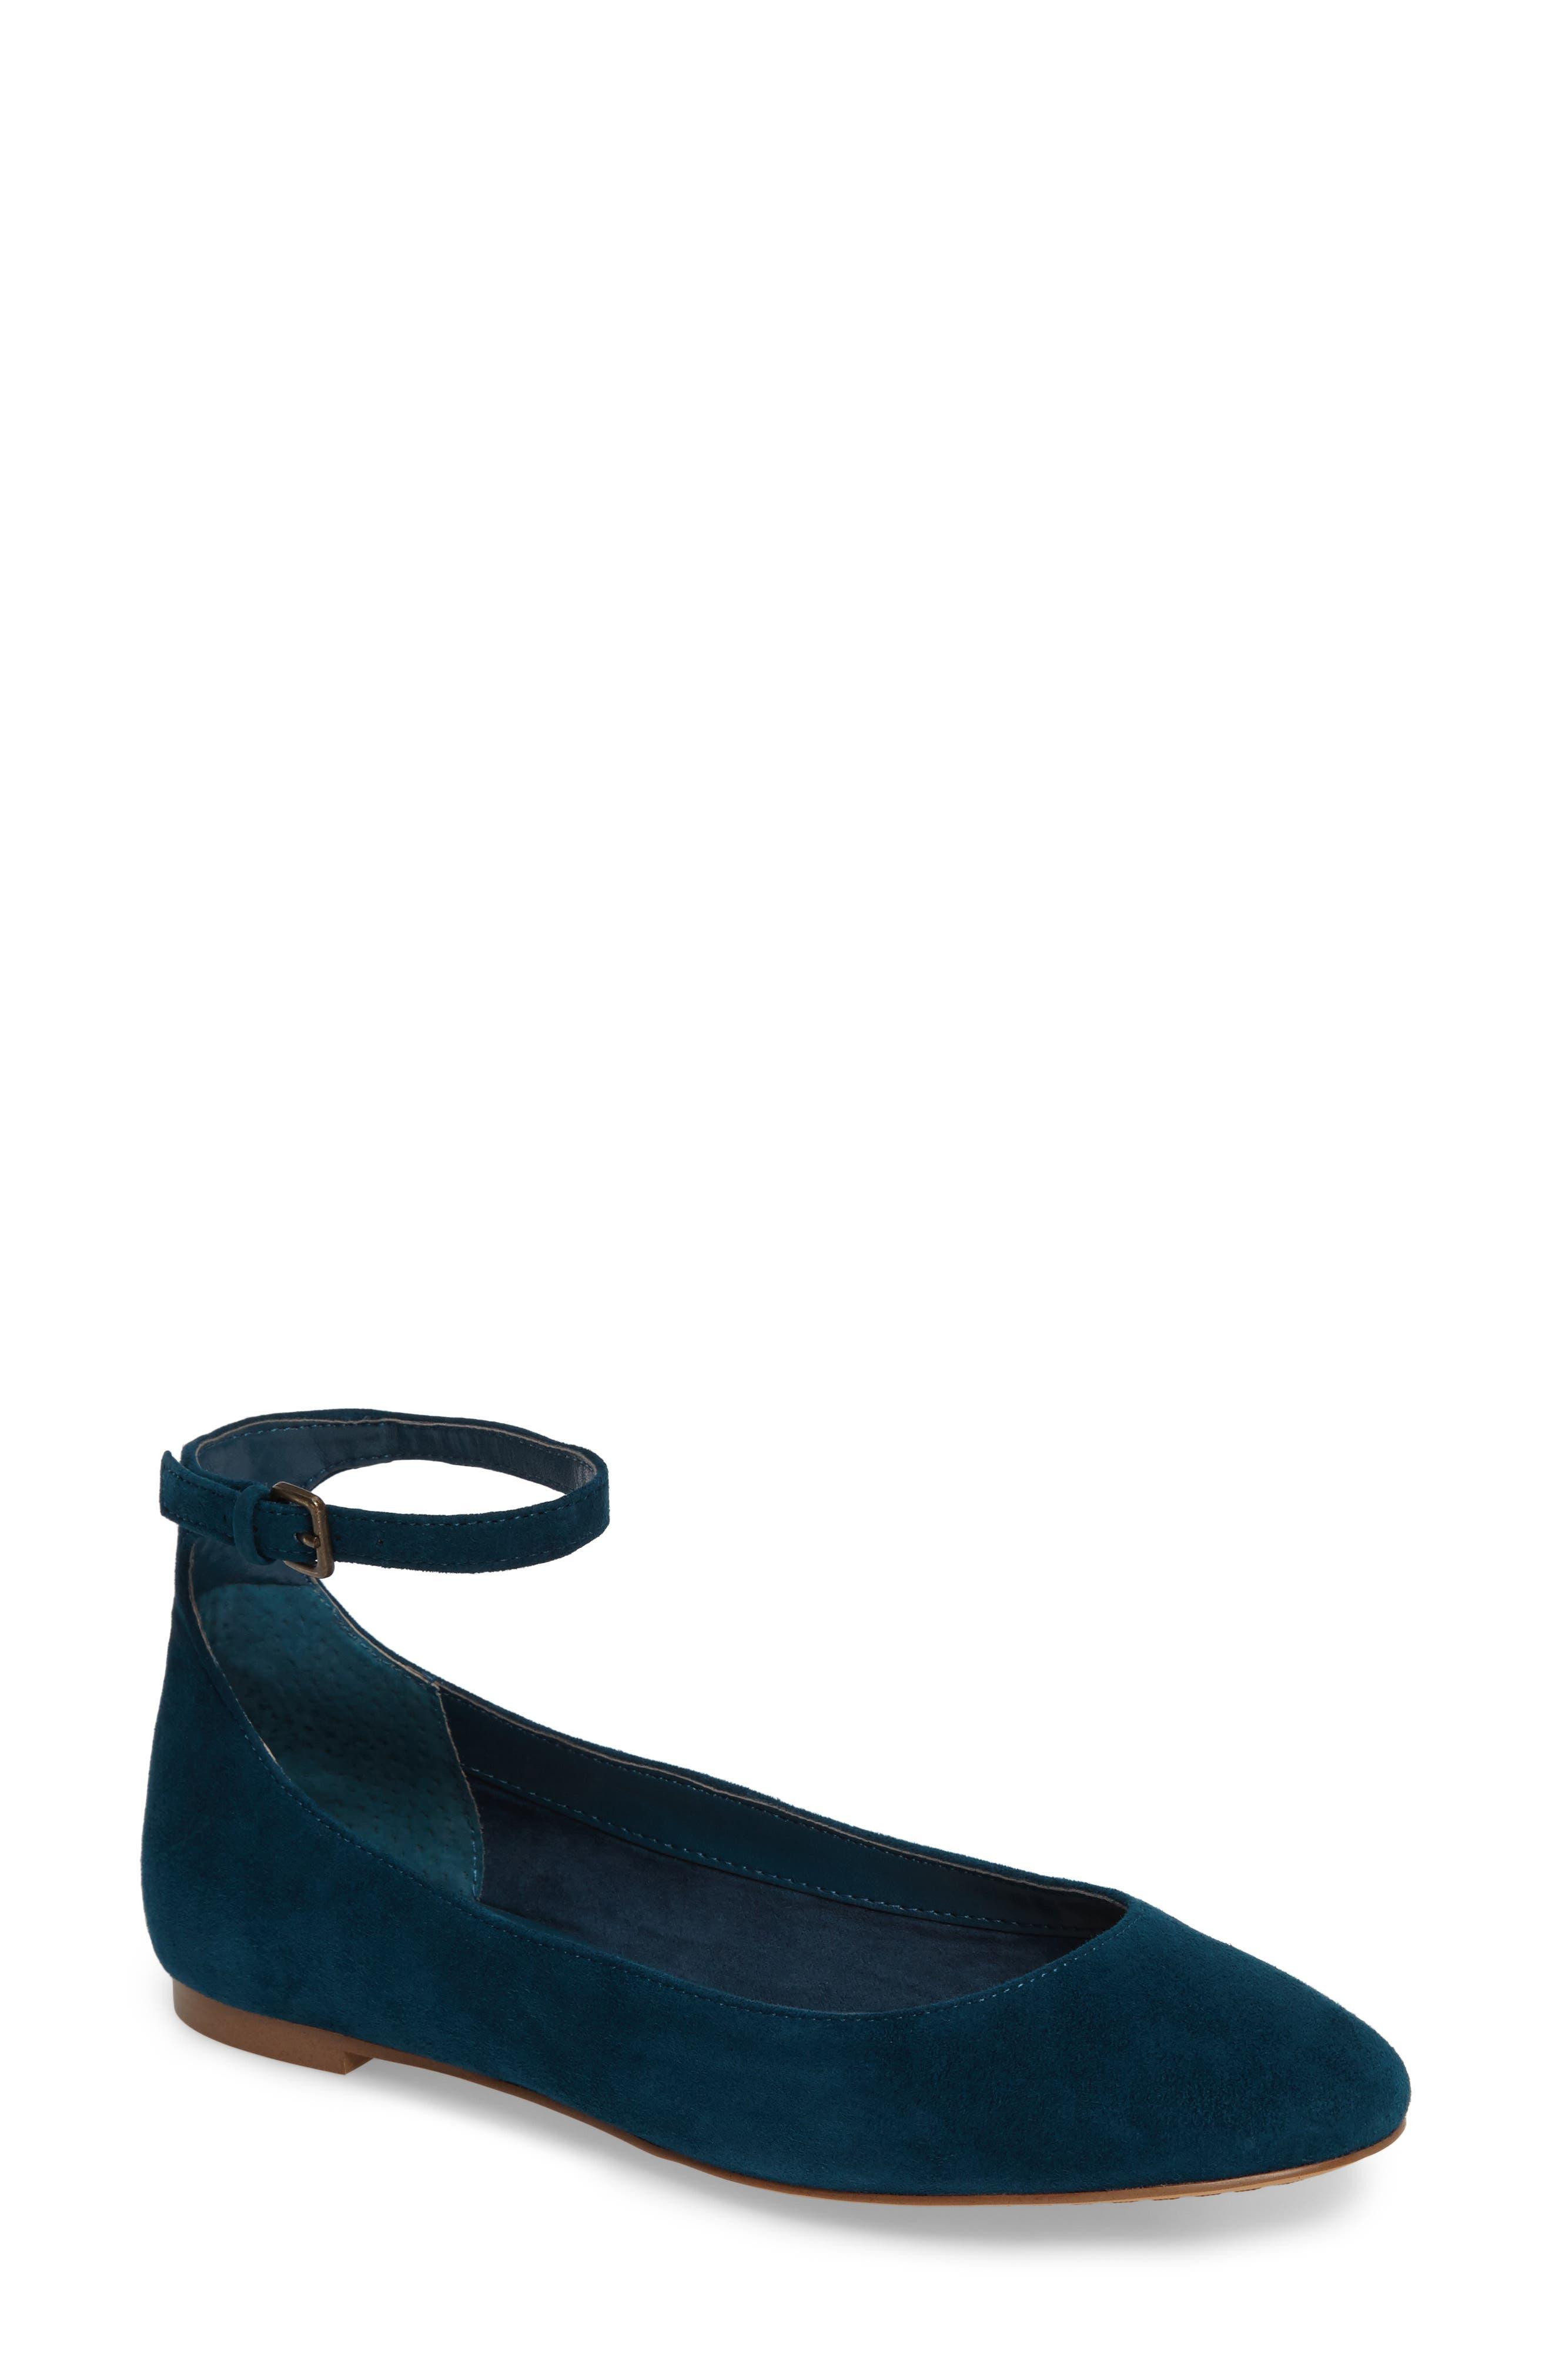 Alternate Image 1 Selected - Treasure & Bond Jules Ankle Strap Ballet Flat (Women)